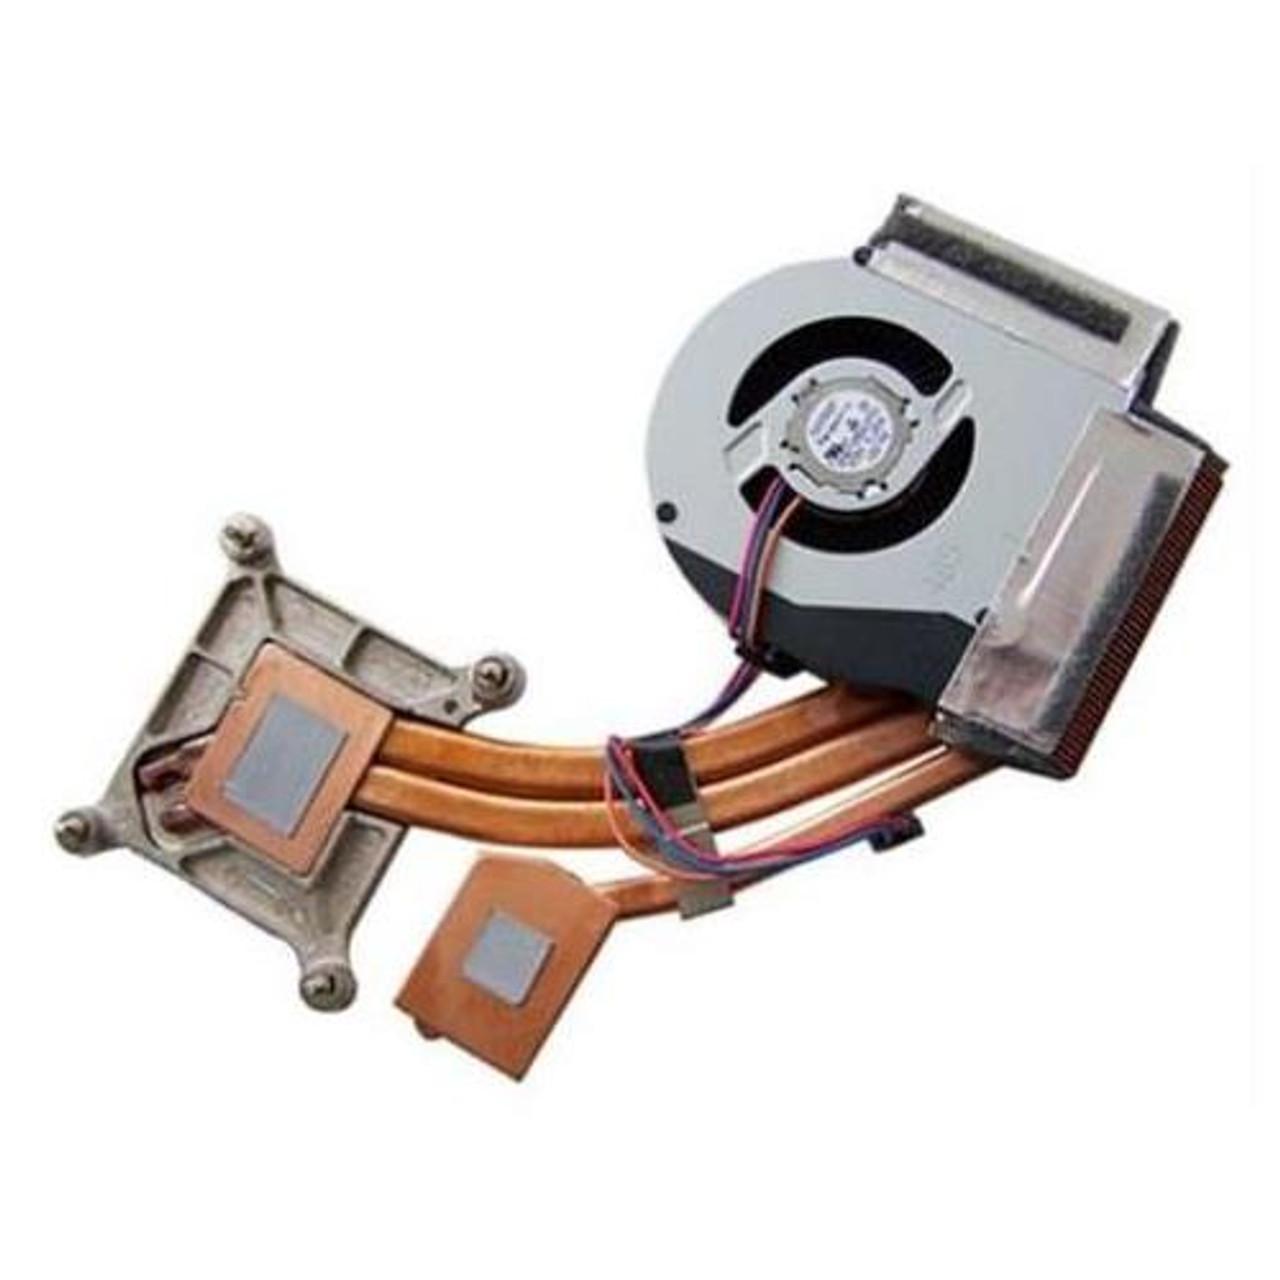 04X1849 Lenovo CPU Fan And Heatsink for ThinkPad T440s